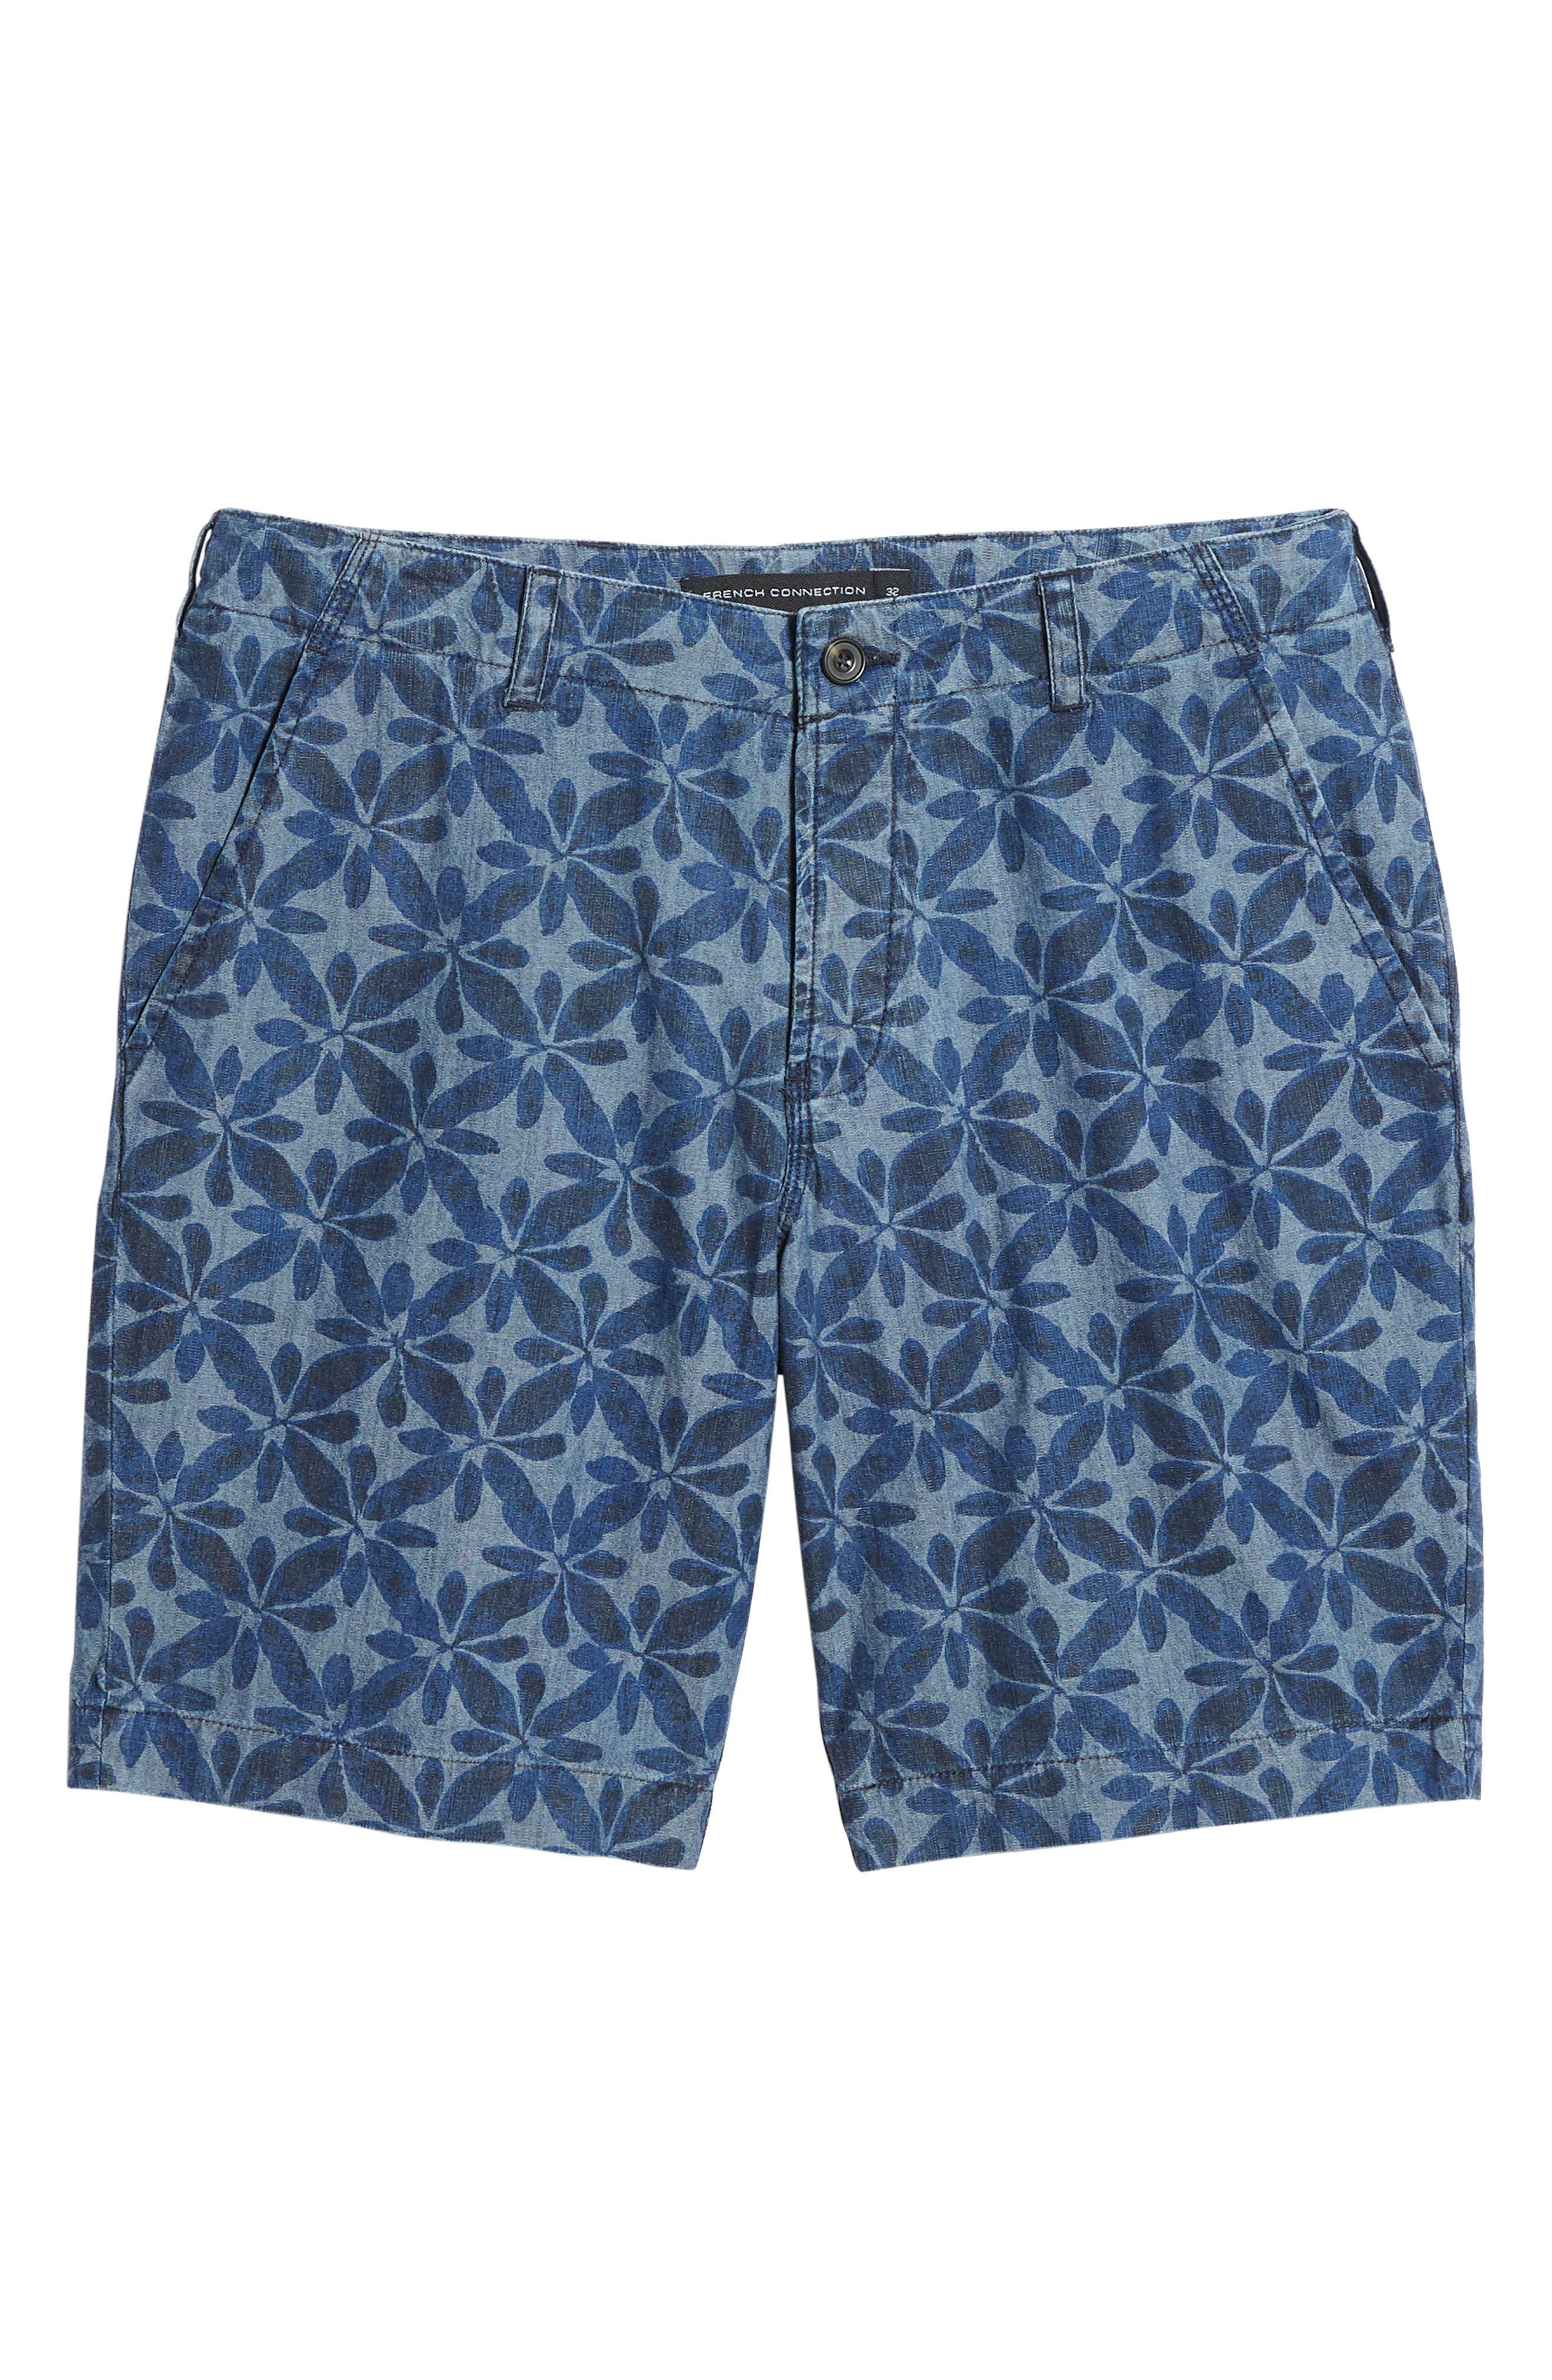 Franju Floral Cotton Shorts,                             Alternate thumbnail 6, color,